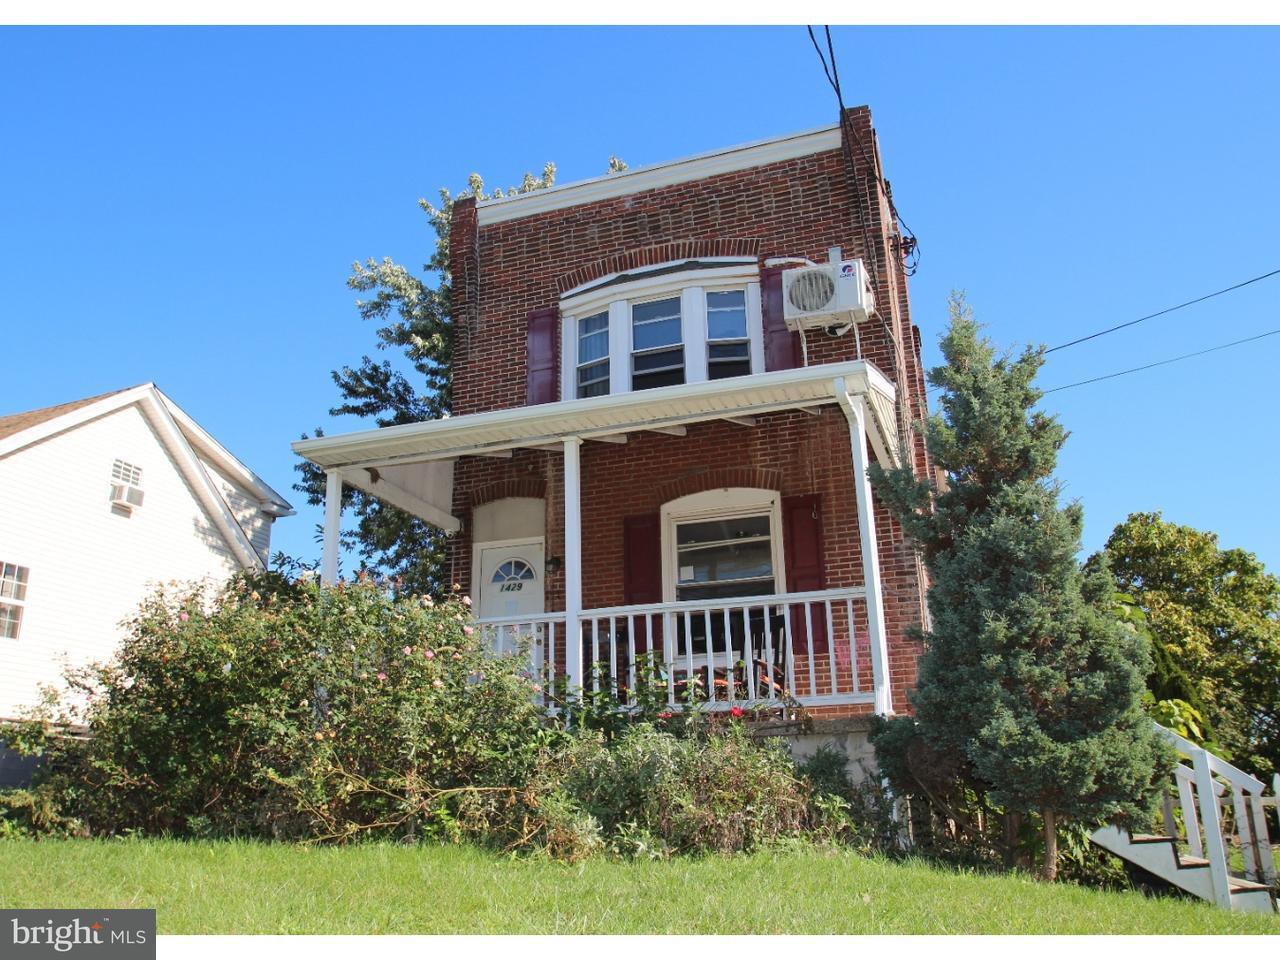 Single Family Home for Sale at 1429 BLUEBALL Avenue Linwood, Pennsylvania 19061 United States